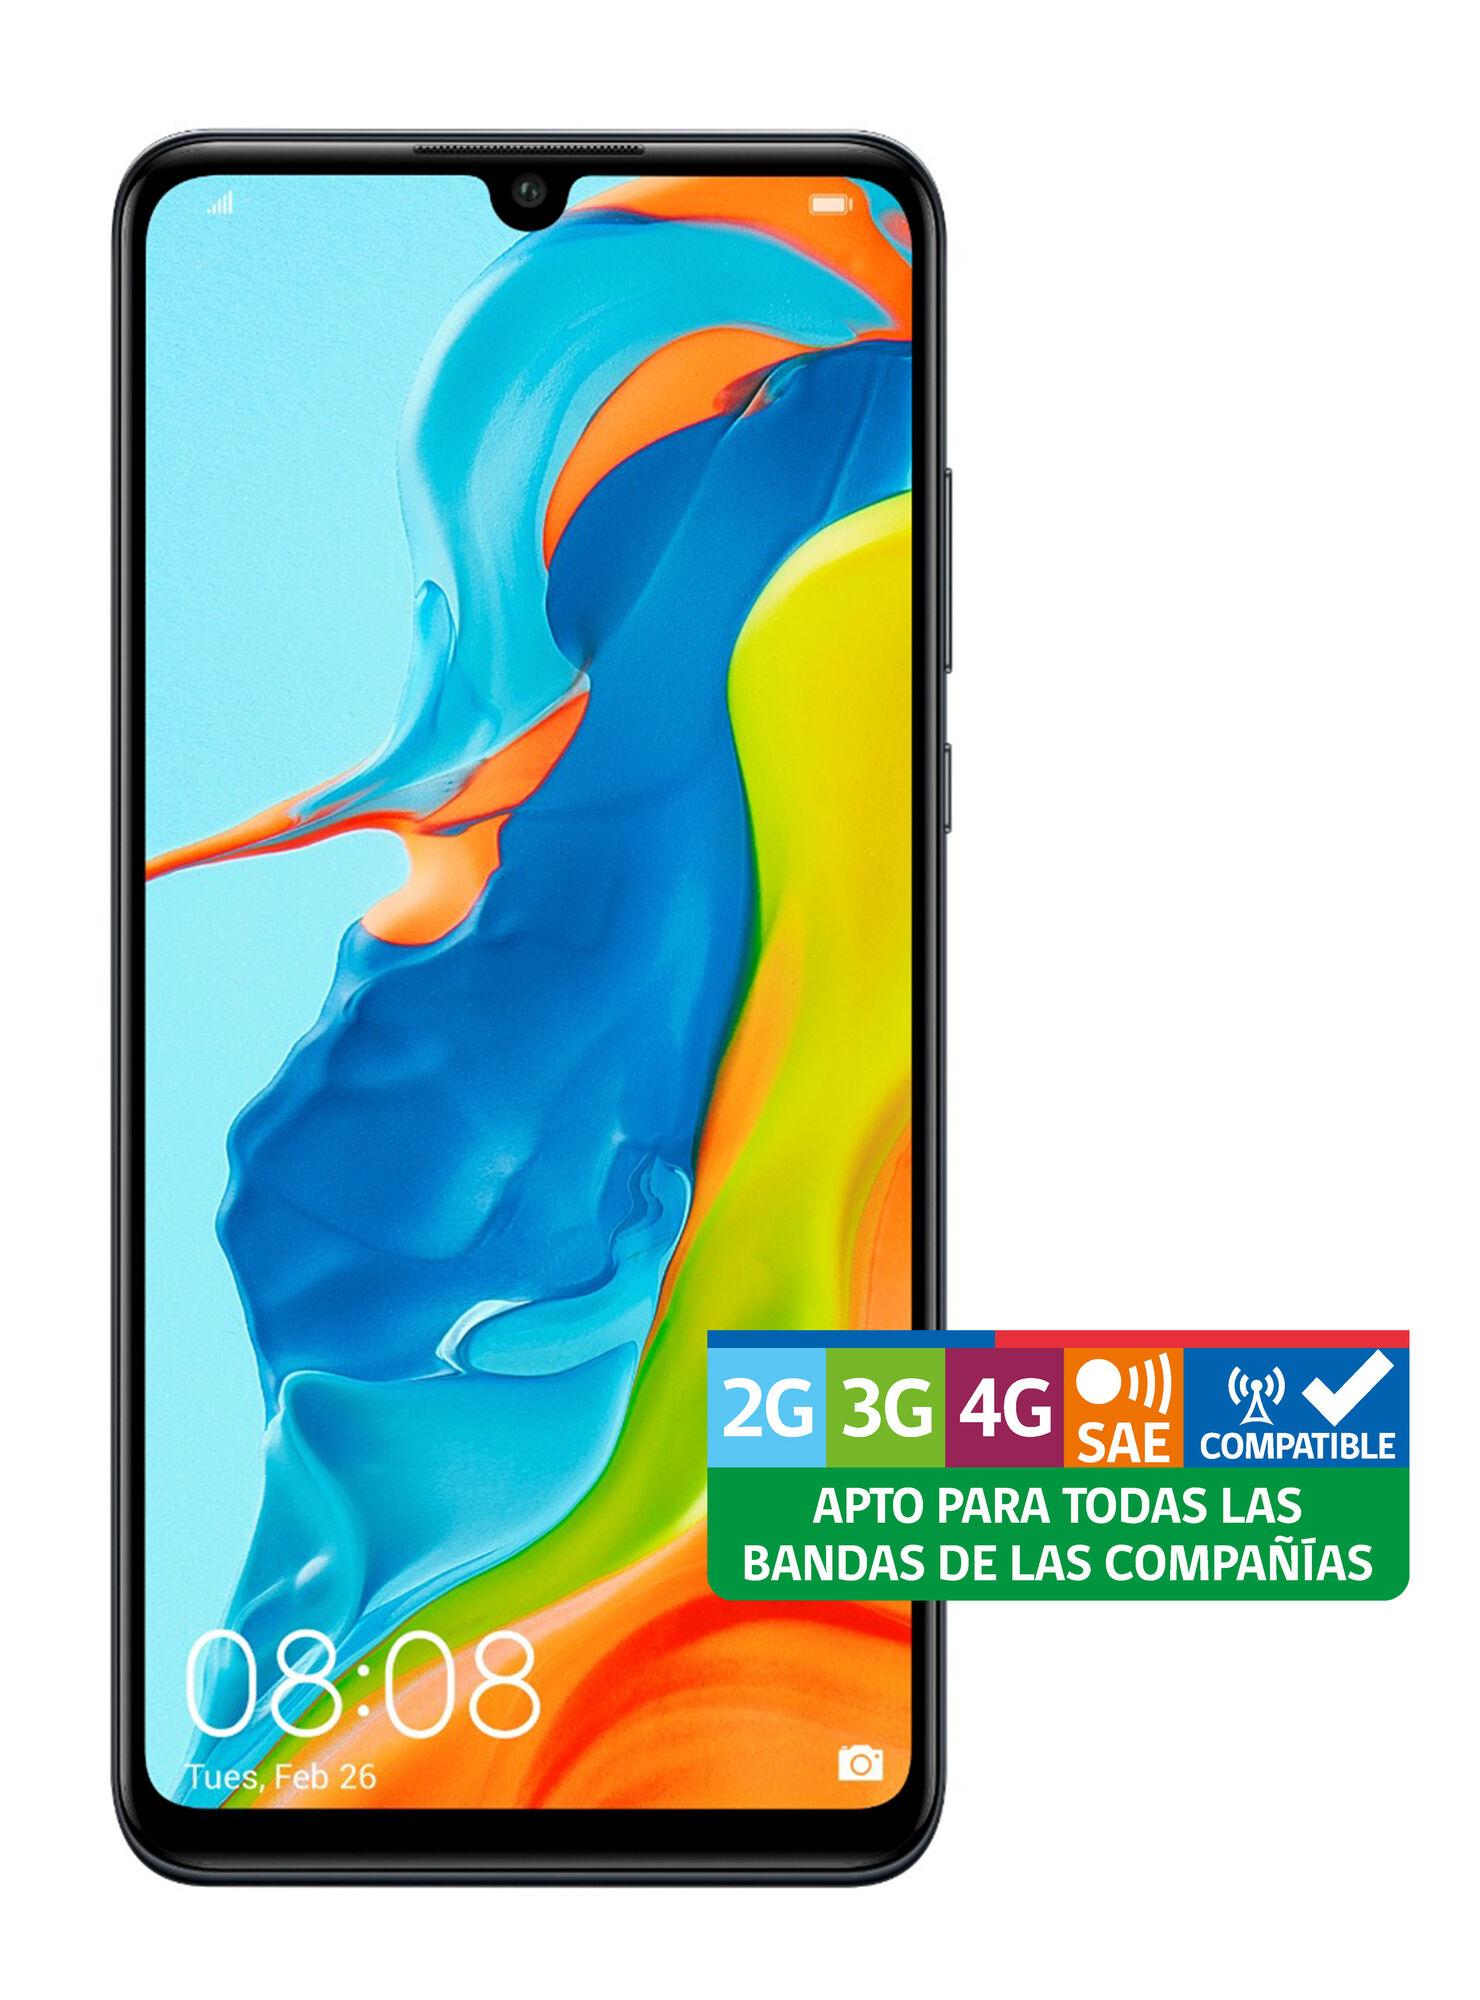 Smartphone Huawei P30 Lite 256 GB Negro Liberado